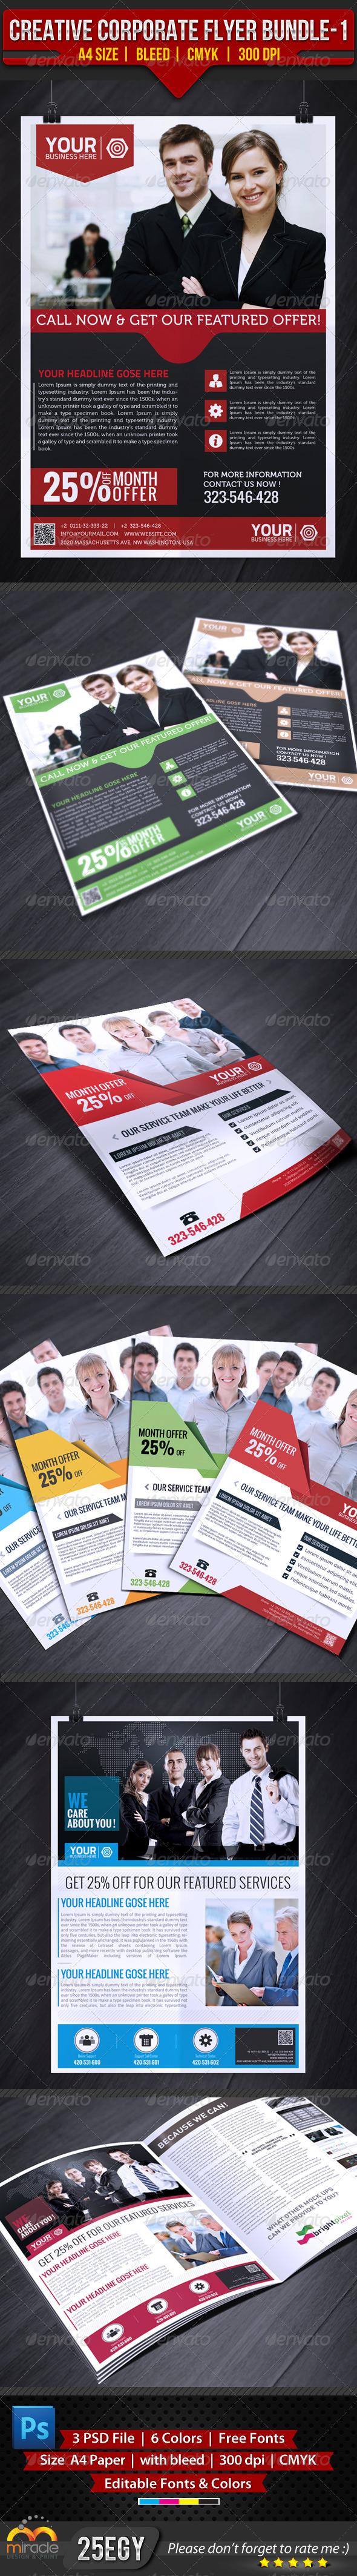 GraphicRiver Creative Corporate Flyer Bundle-1 4698261